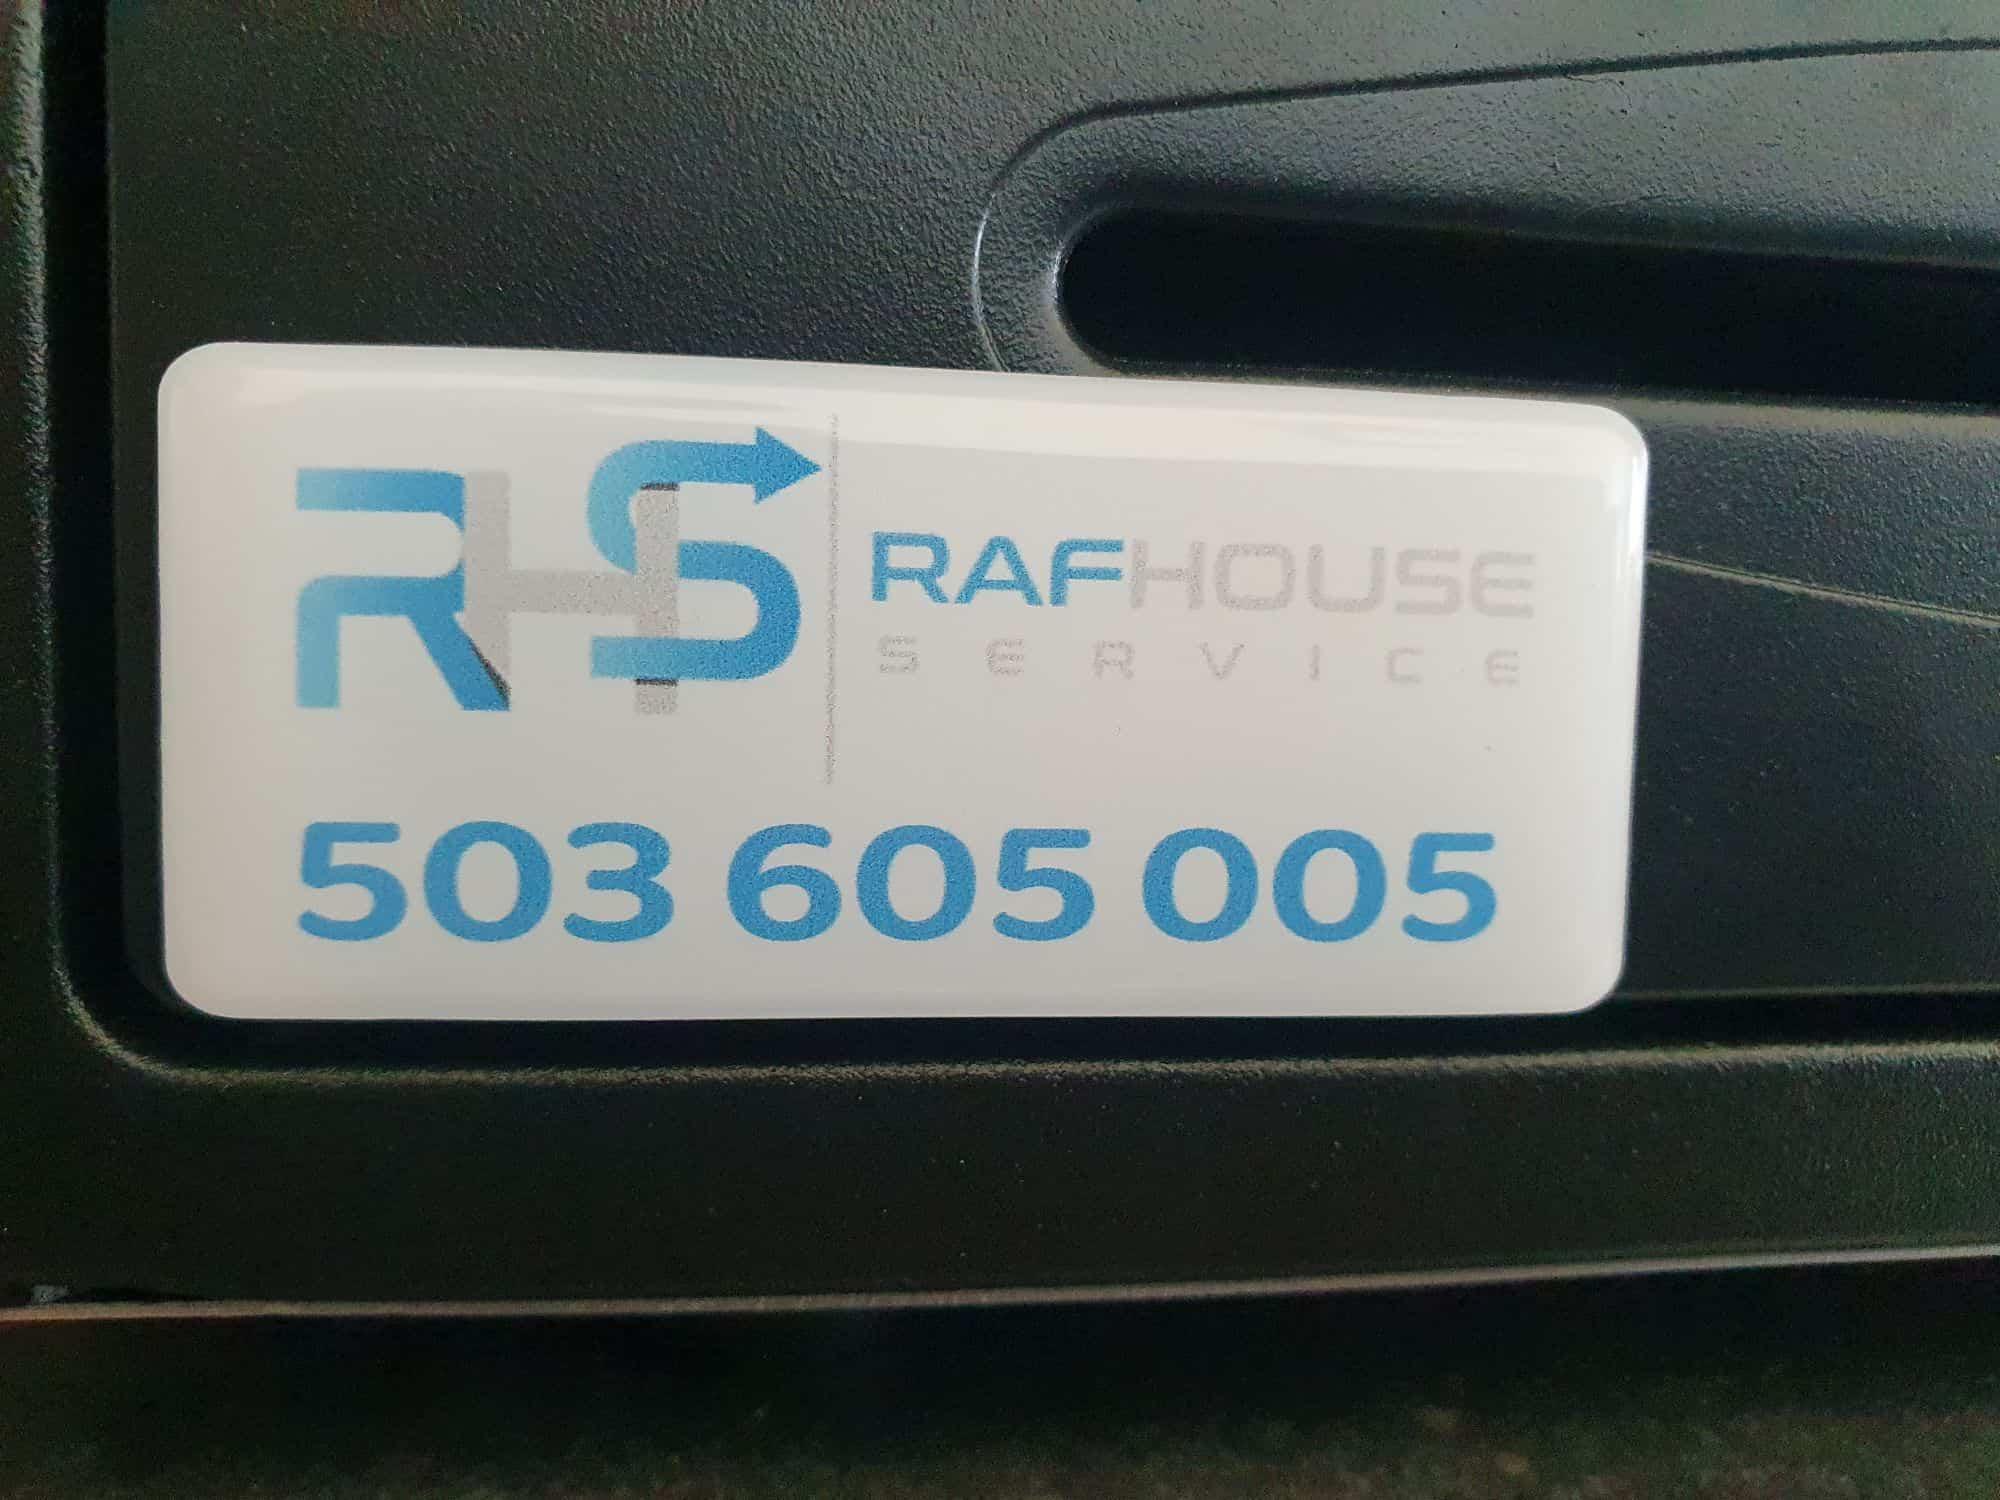 naklejki wypukłe z logo RafHouse service